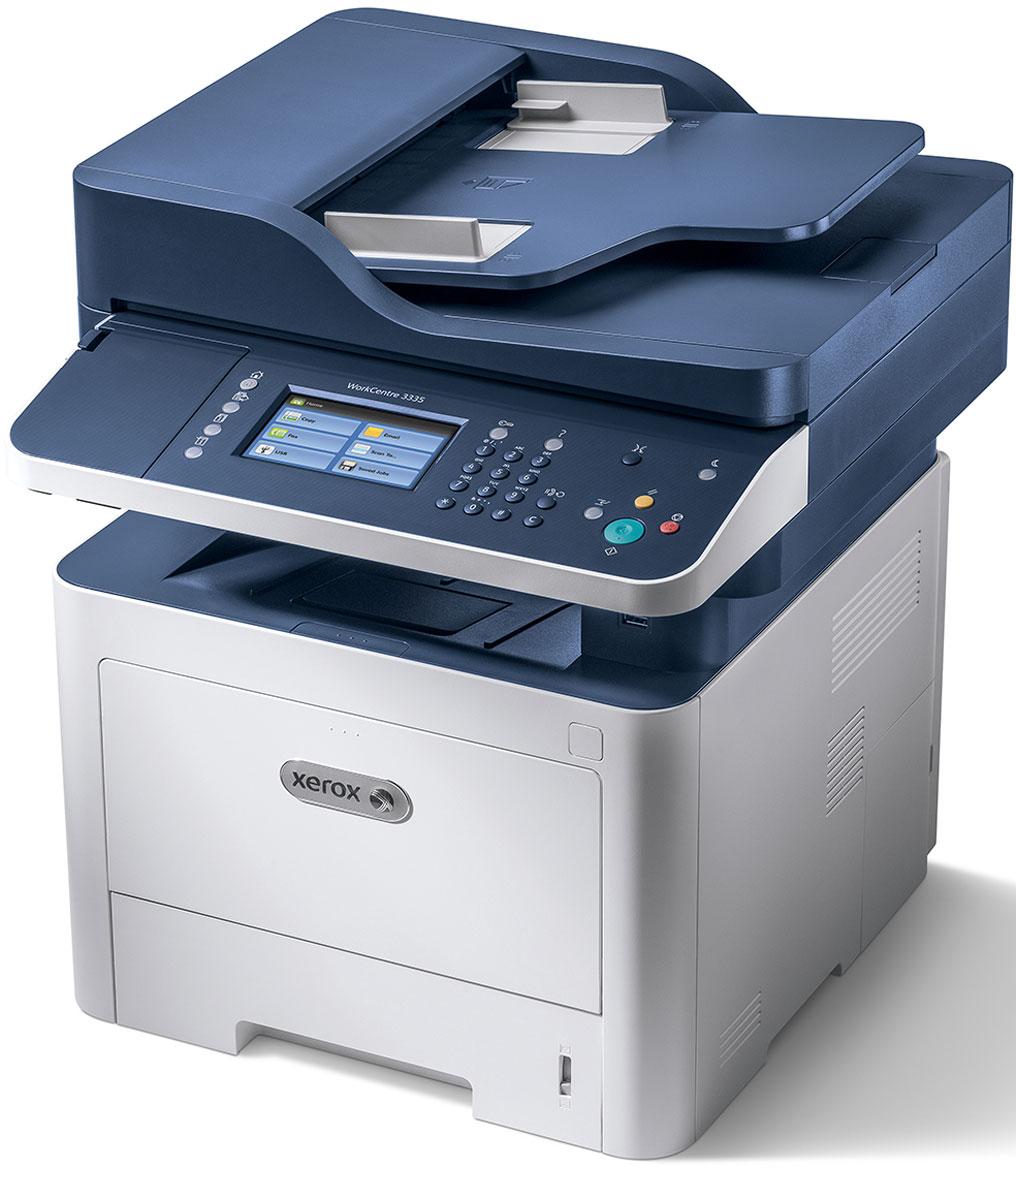 все цены на Xerox WorkCentre 3335DNI МФУ онлайн